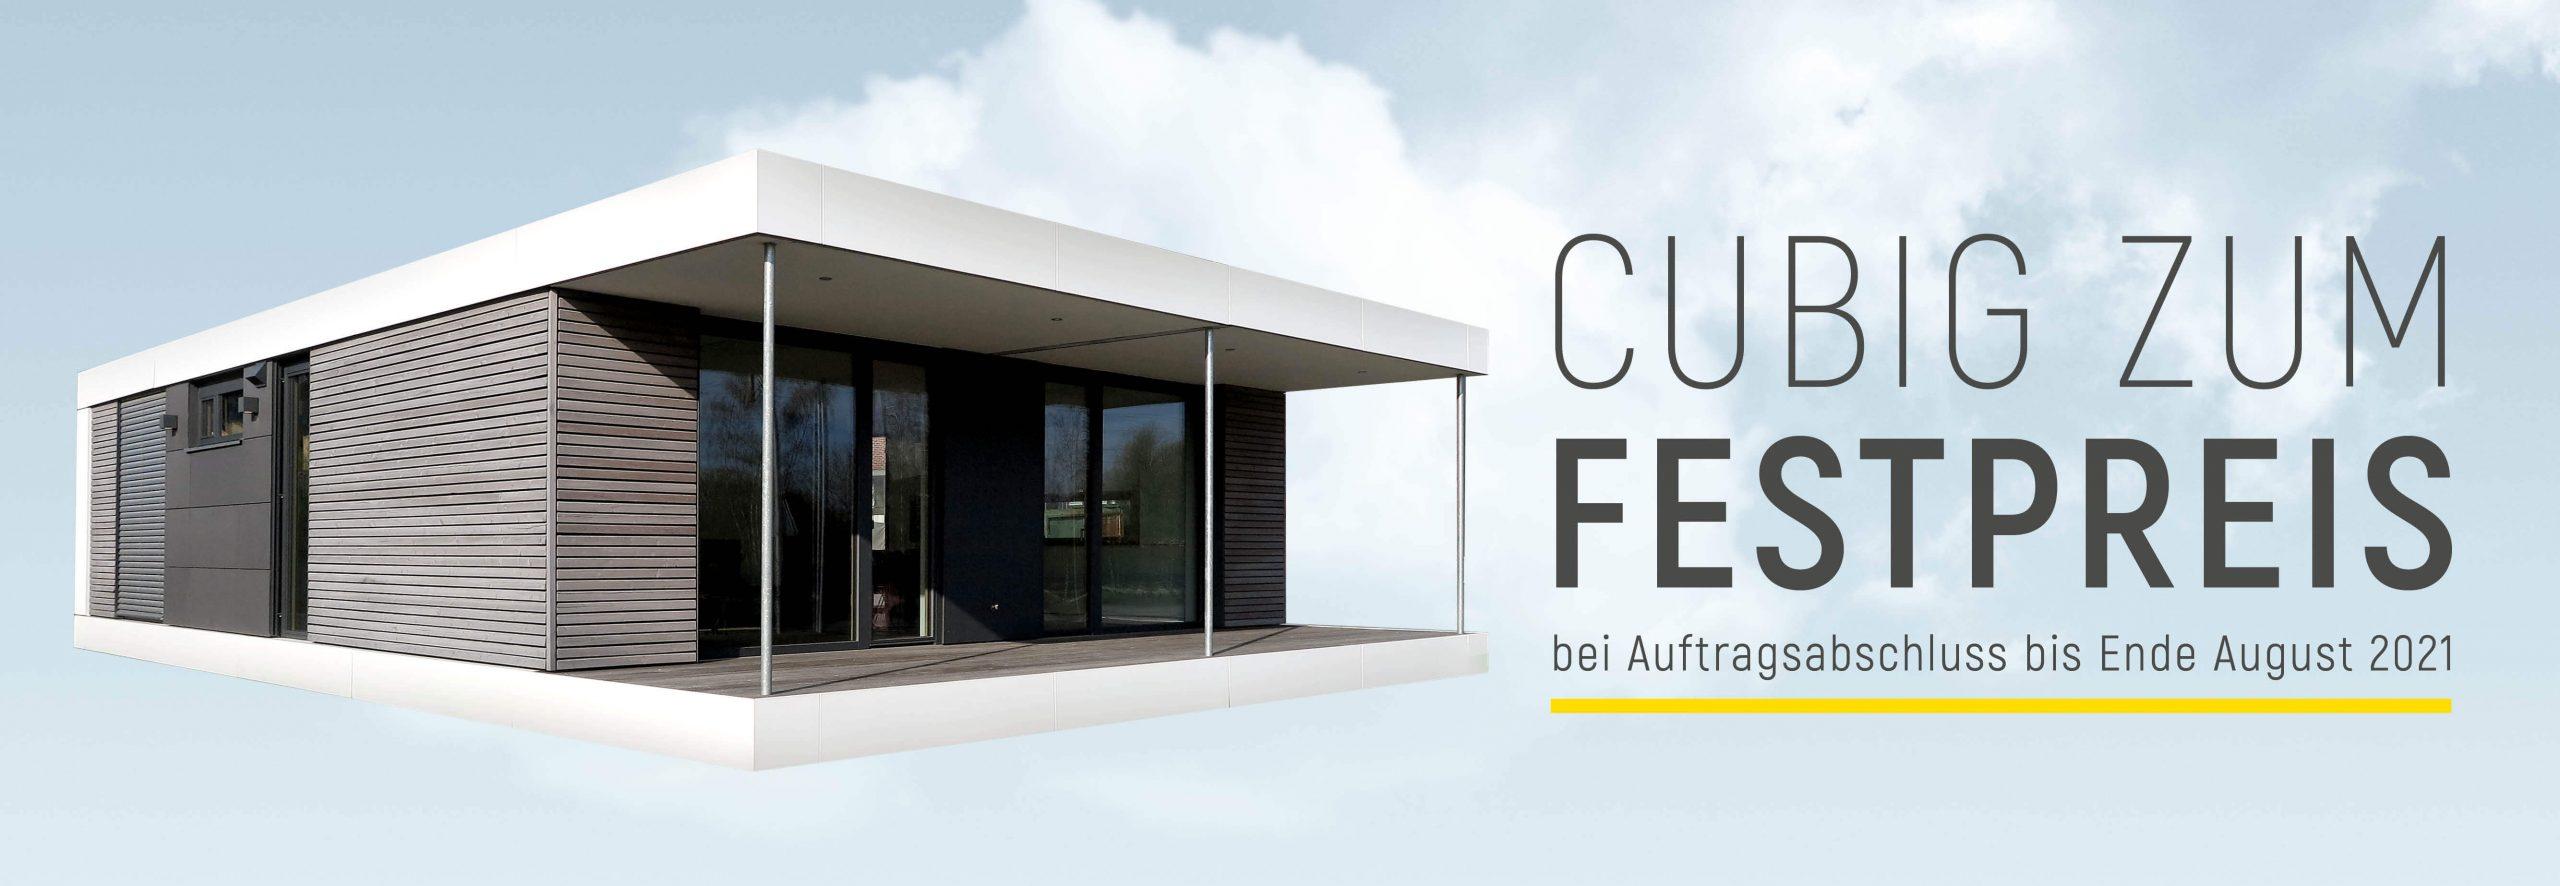 CUBIG Festpreisgarantie bis August 2021